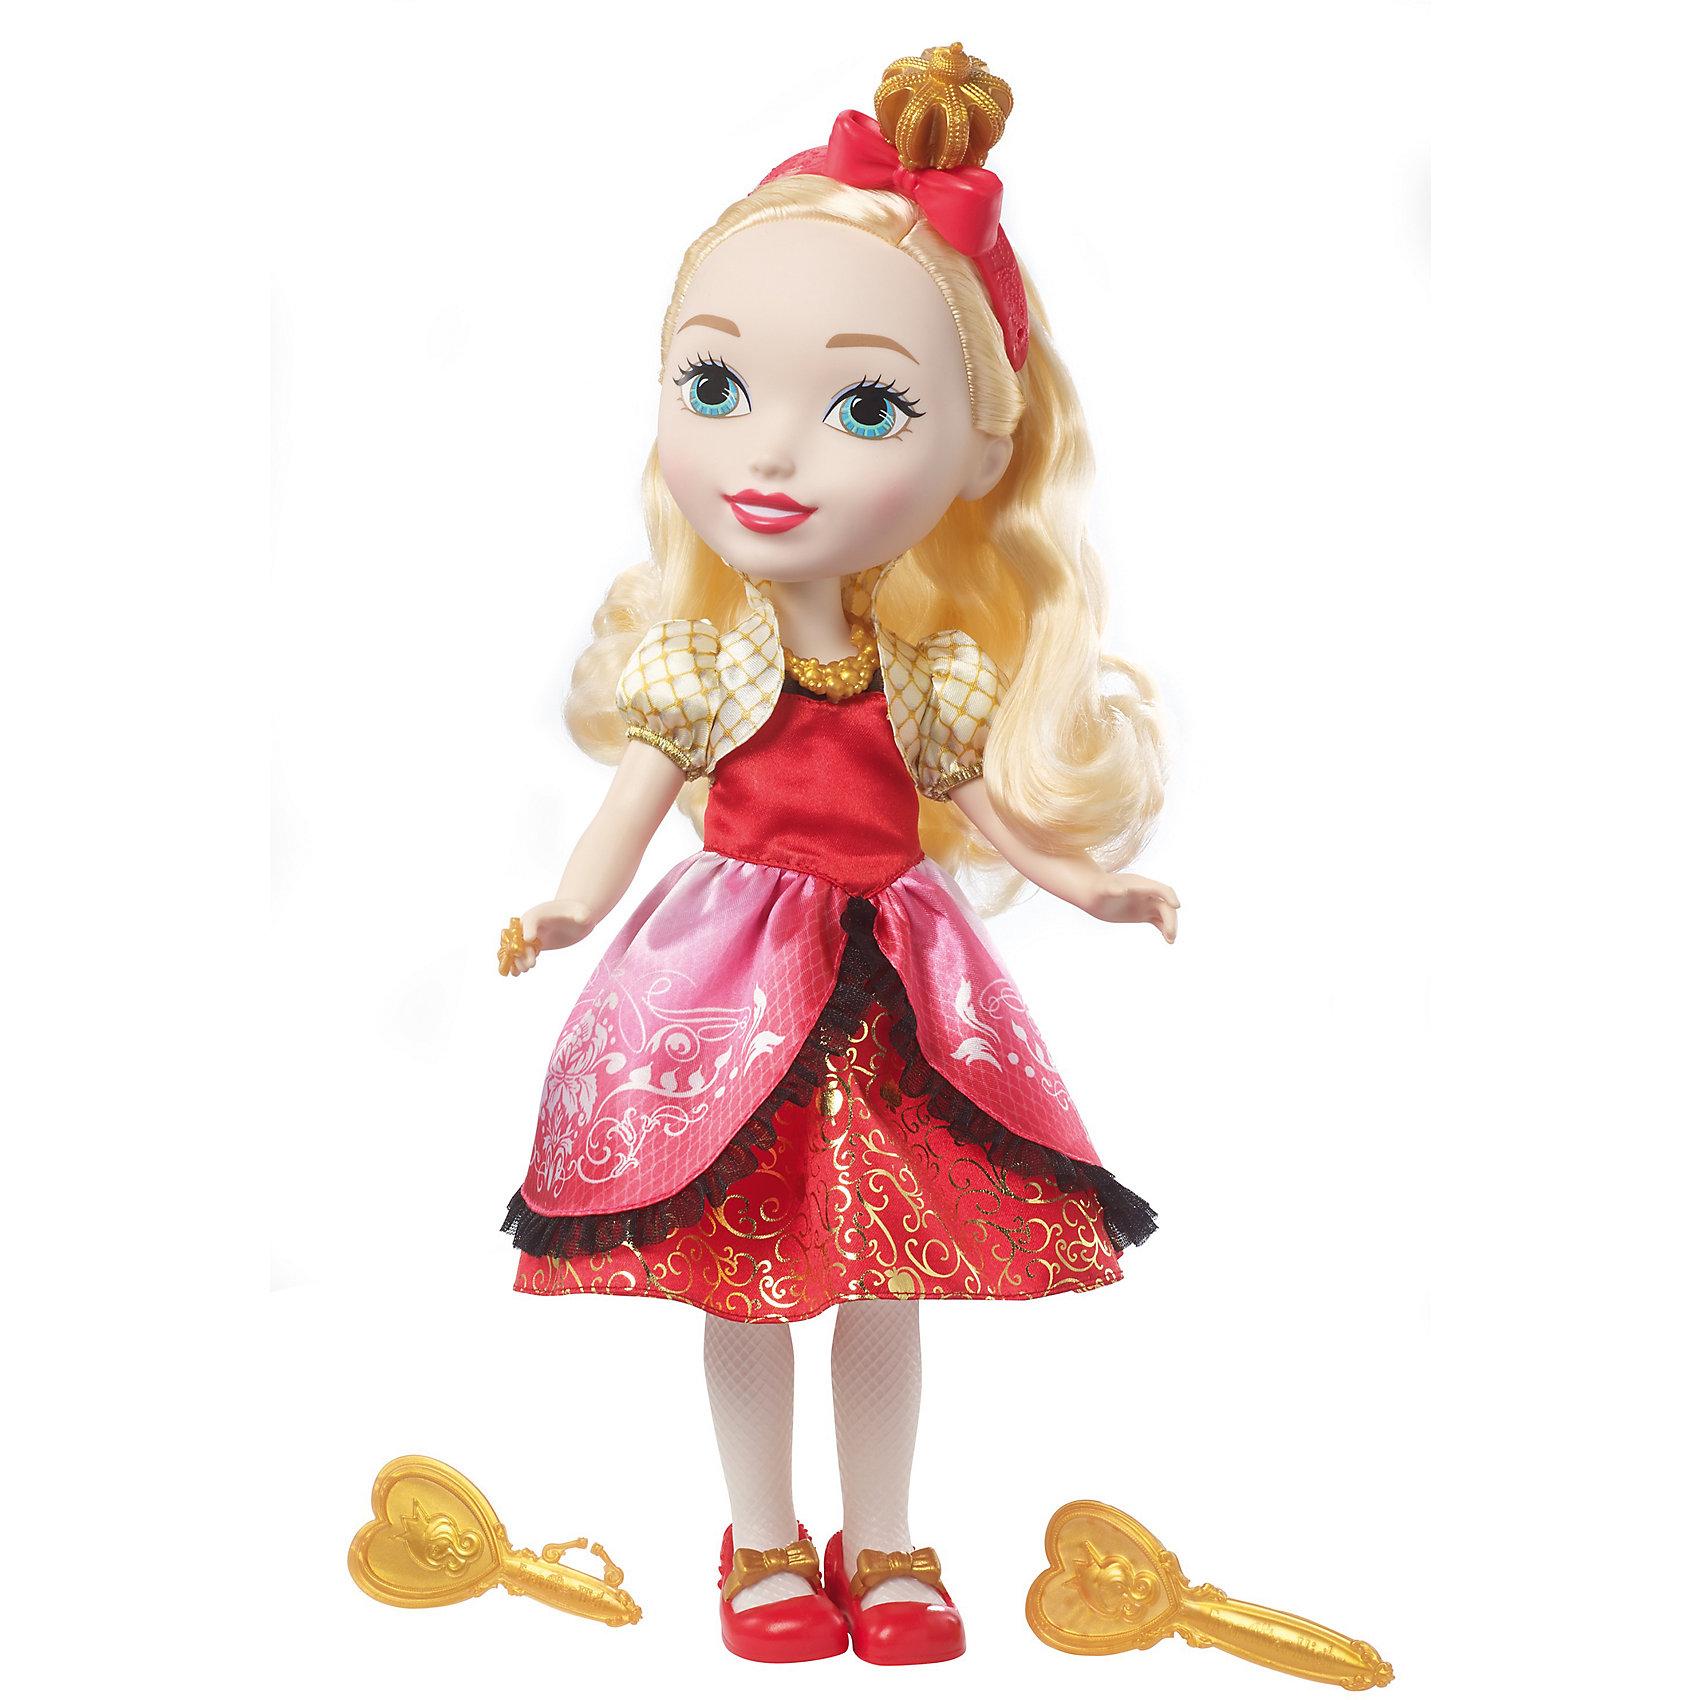 Большая  кукла принцесса Эппл Уайт, Ever After HighКуклы-модели<br><br><br>Ширина мм: 205<br>Глубина мм: 110<br>Высота мм: 380<br>Вес г: 734<br>Возраст от месяцев: 36<br>Возраст до месяцев: 120<br>Пол: Женский<br>Возраст: Детский<br>SKU: 6673370